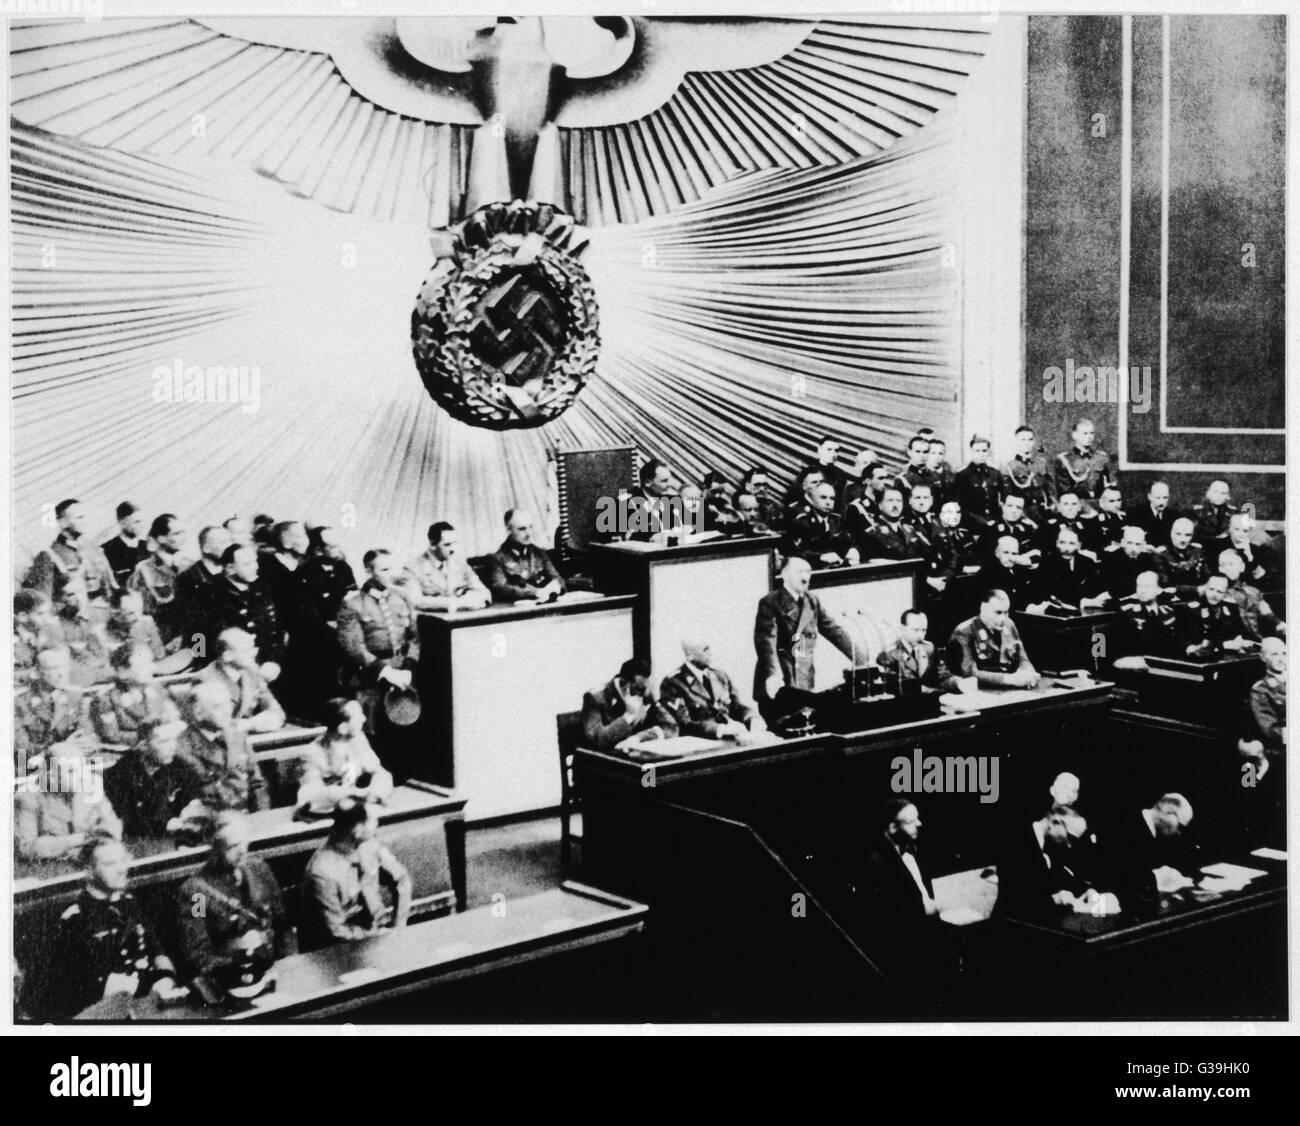 Adolf Hitler's speech to the  Reichstag.         Date: 1 September 1939 - Stock Image